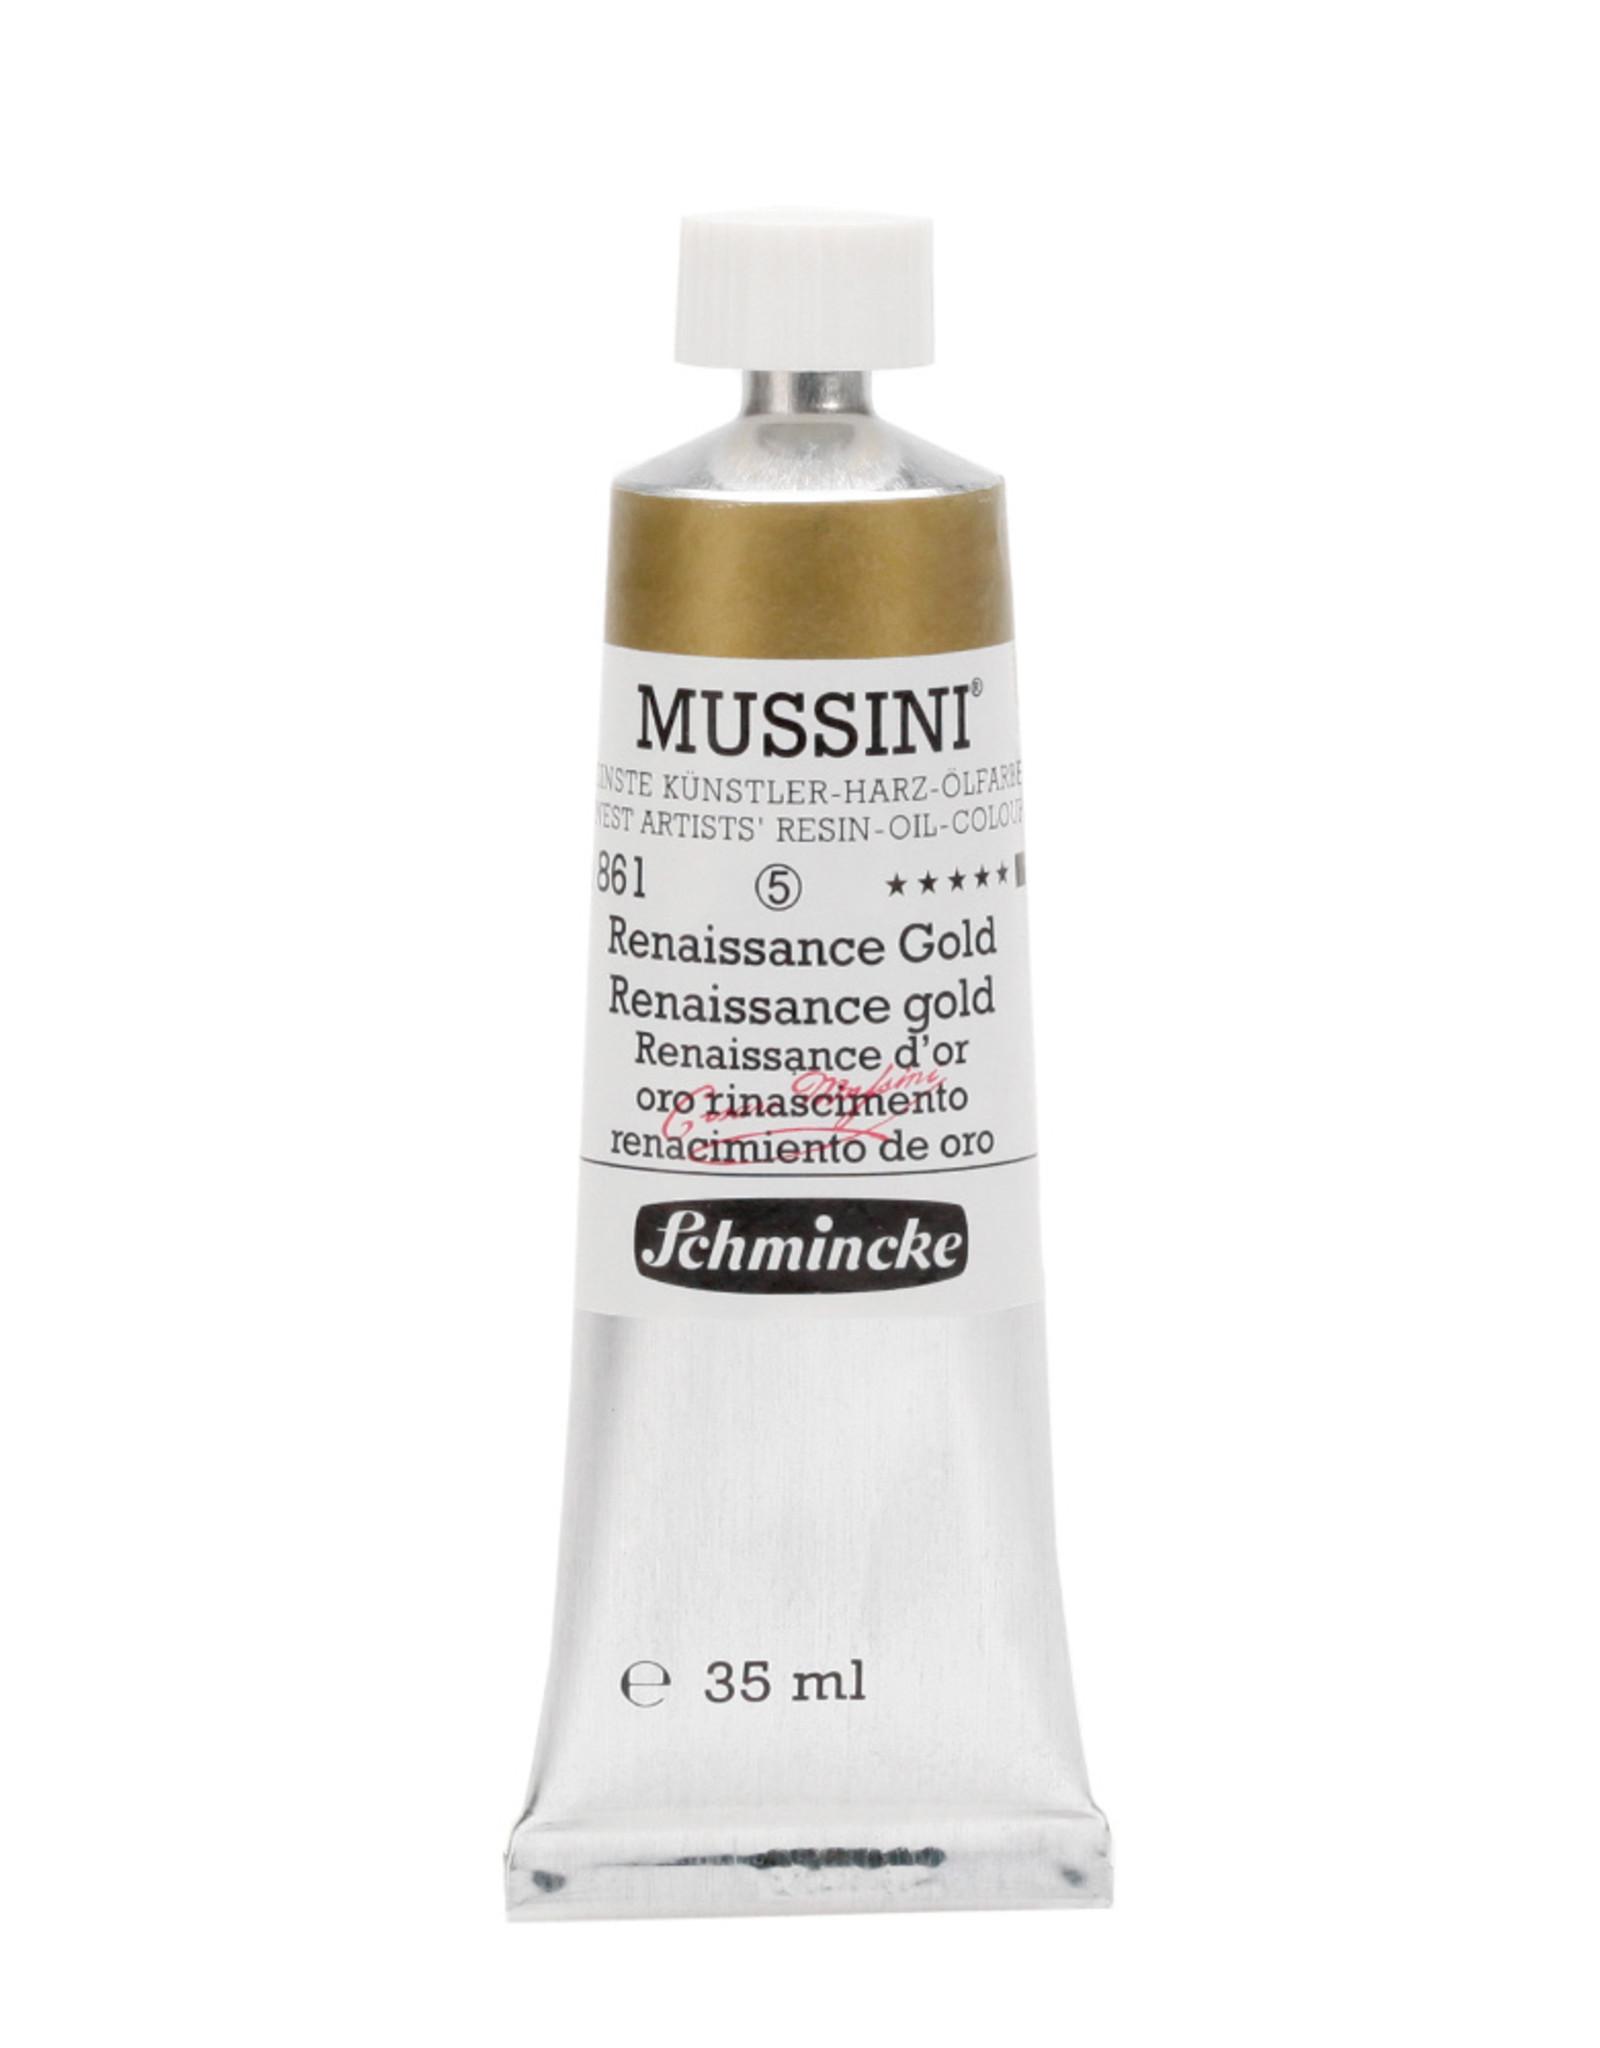 Schmincke Olieverf Mussini 35 ml Goud Renaissance 861/5